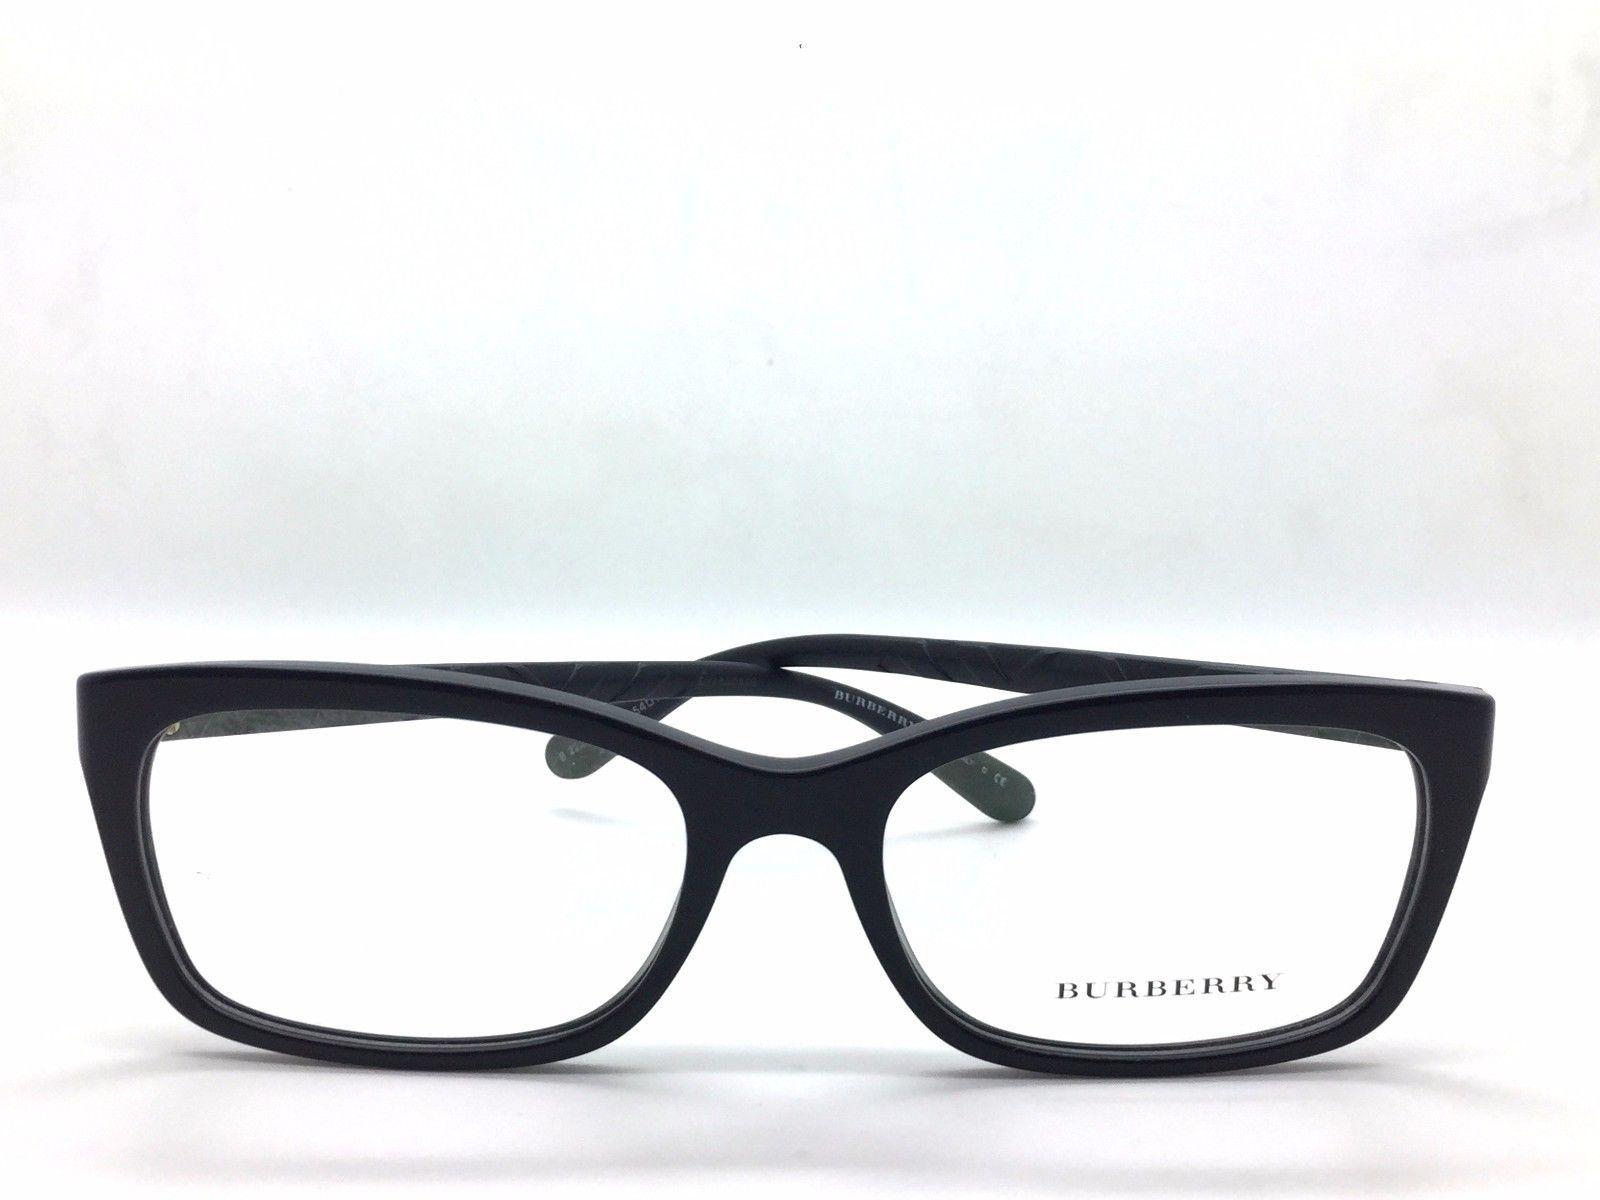 476b98f4cbd ... Burberry Black Rectangle BE b 2220 3001 Eyeglasses with 54mm Lens ...